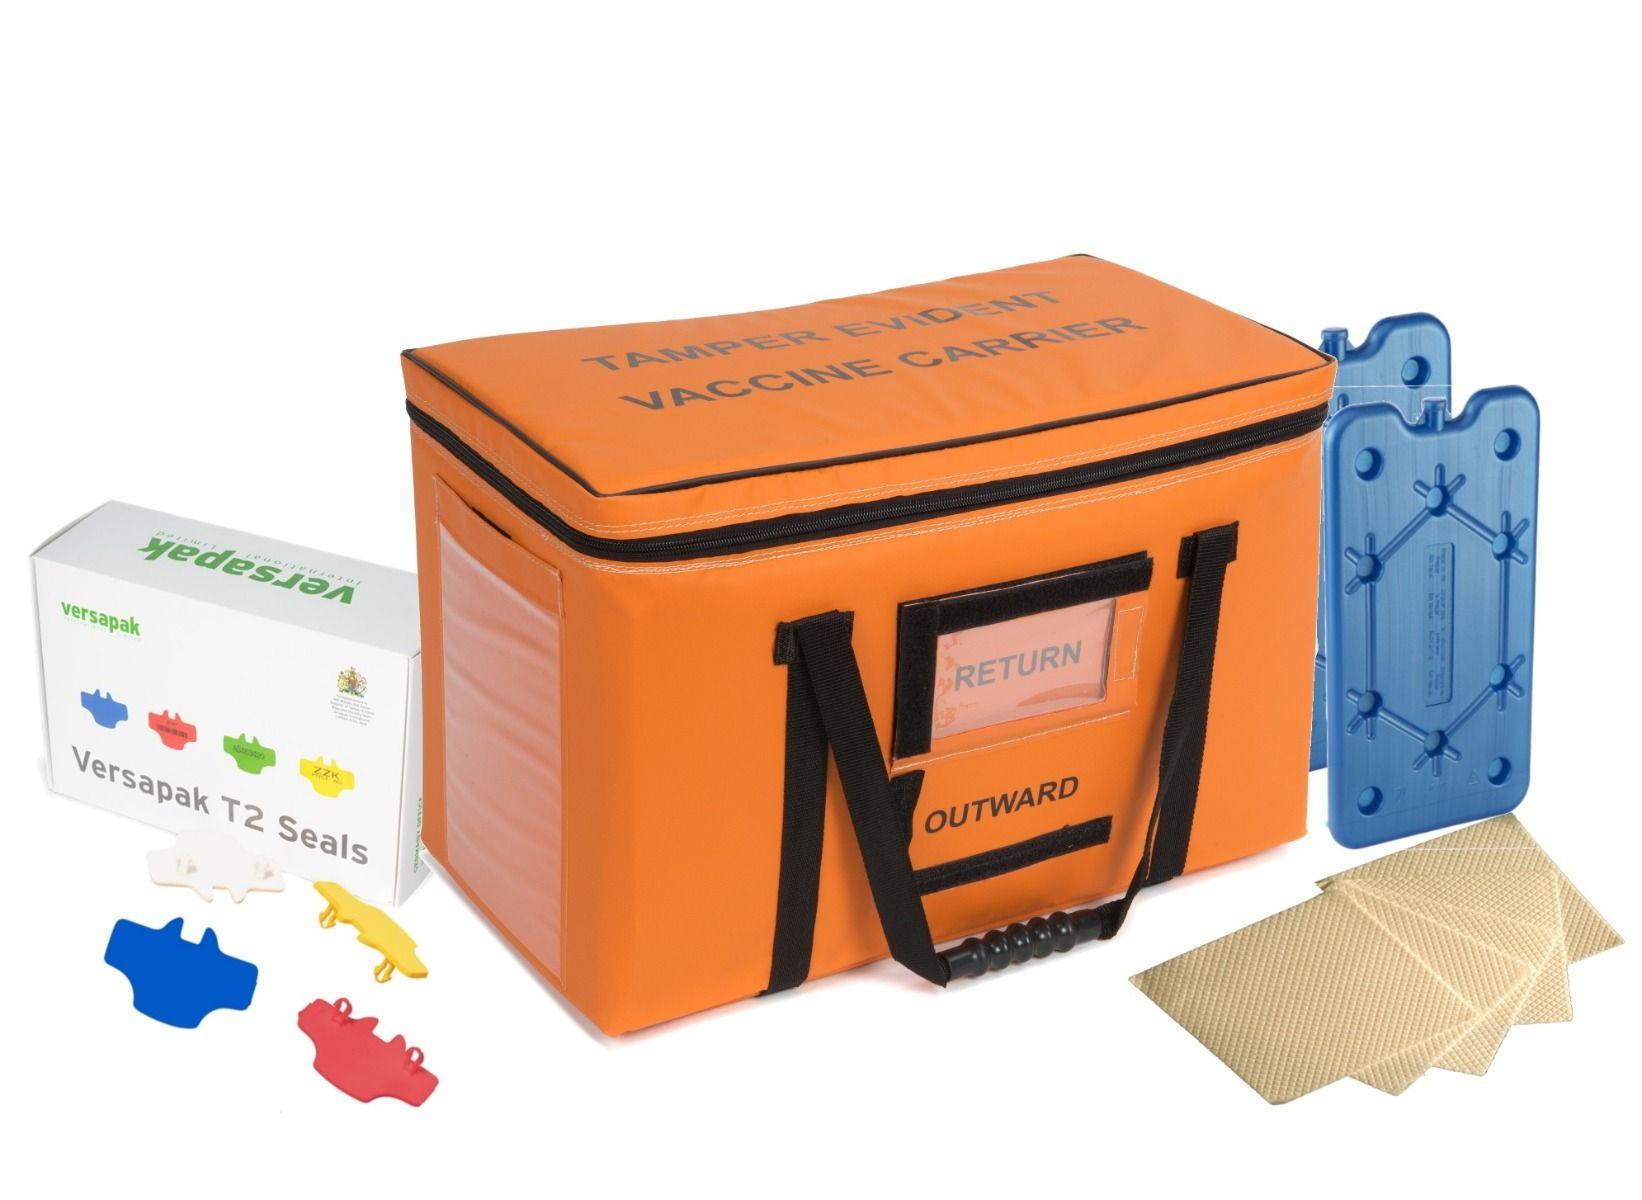 Medium Insulated Medicine Carrier Thermal Bundle - Vaccines